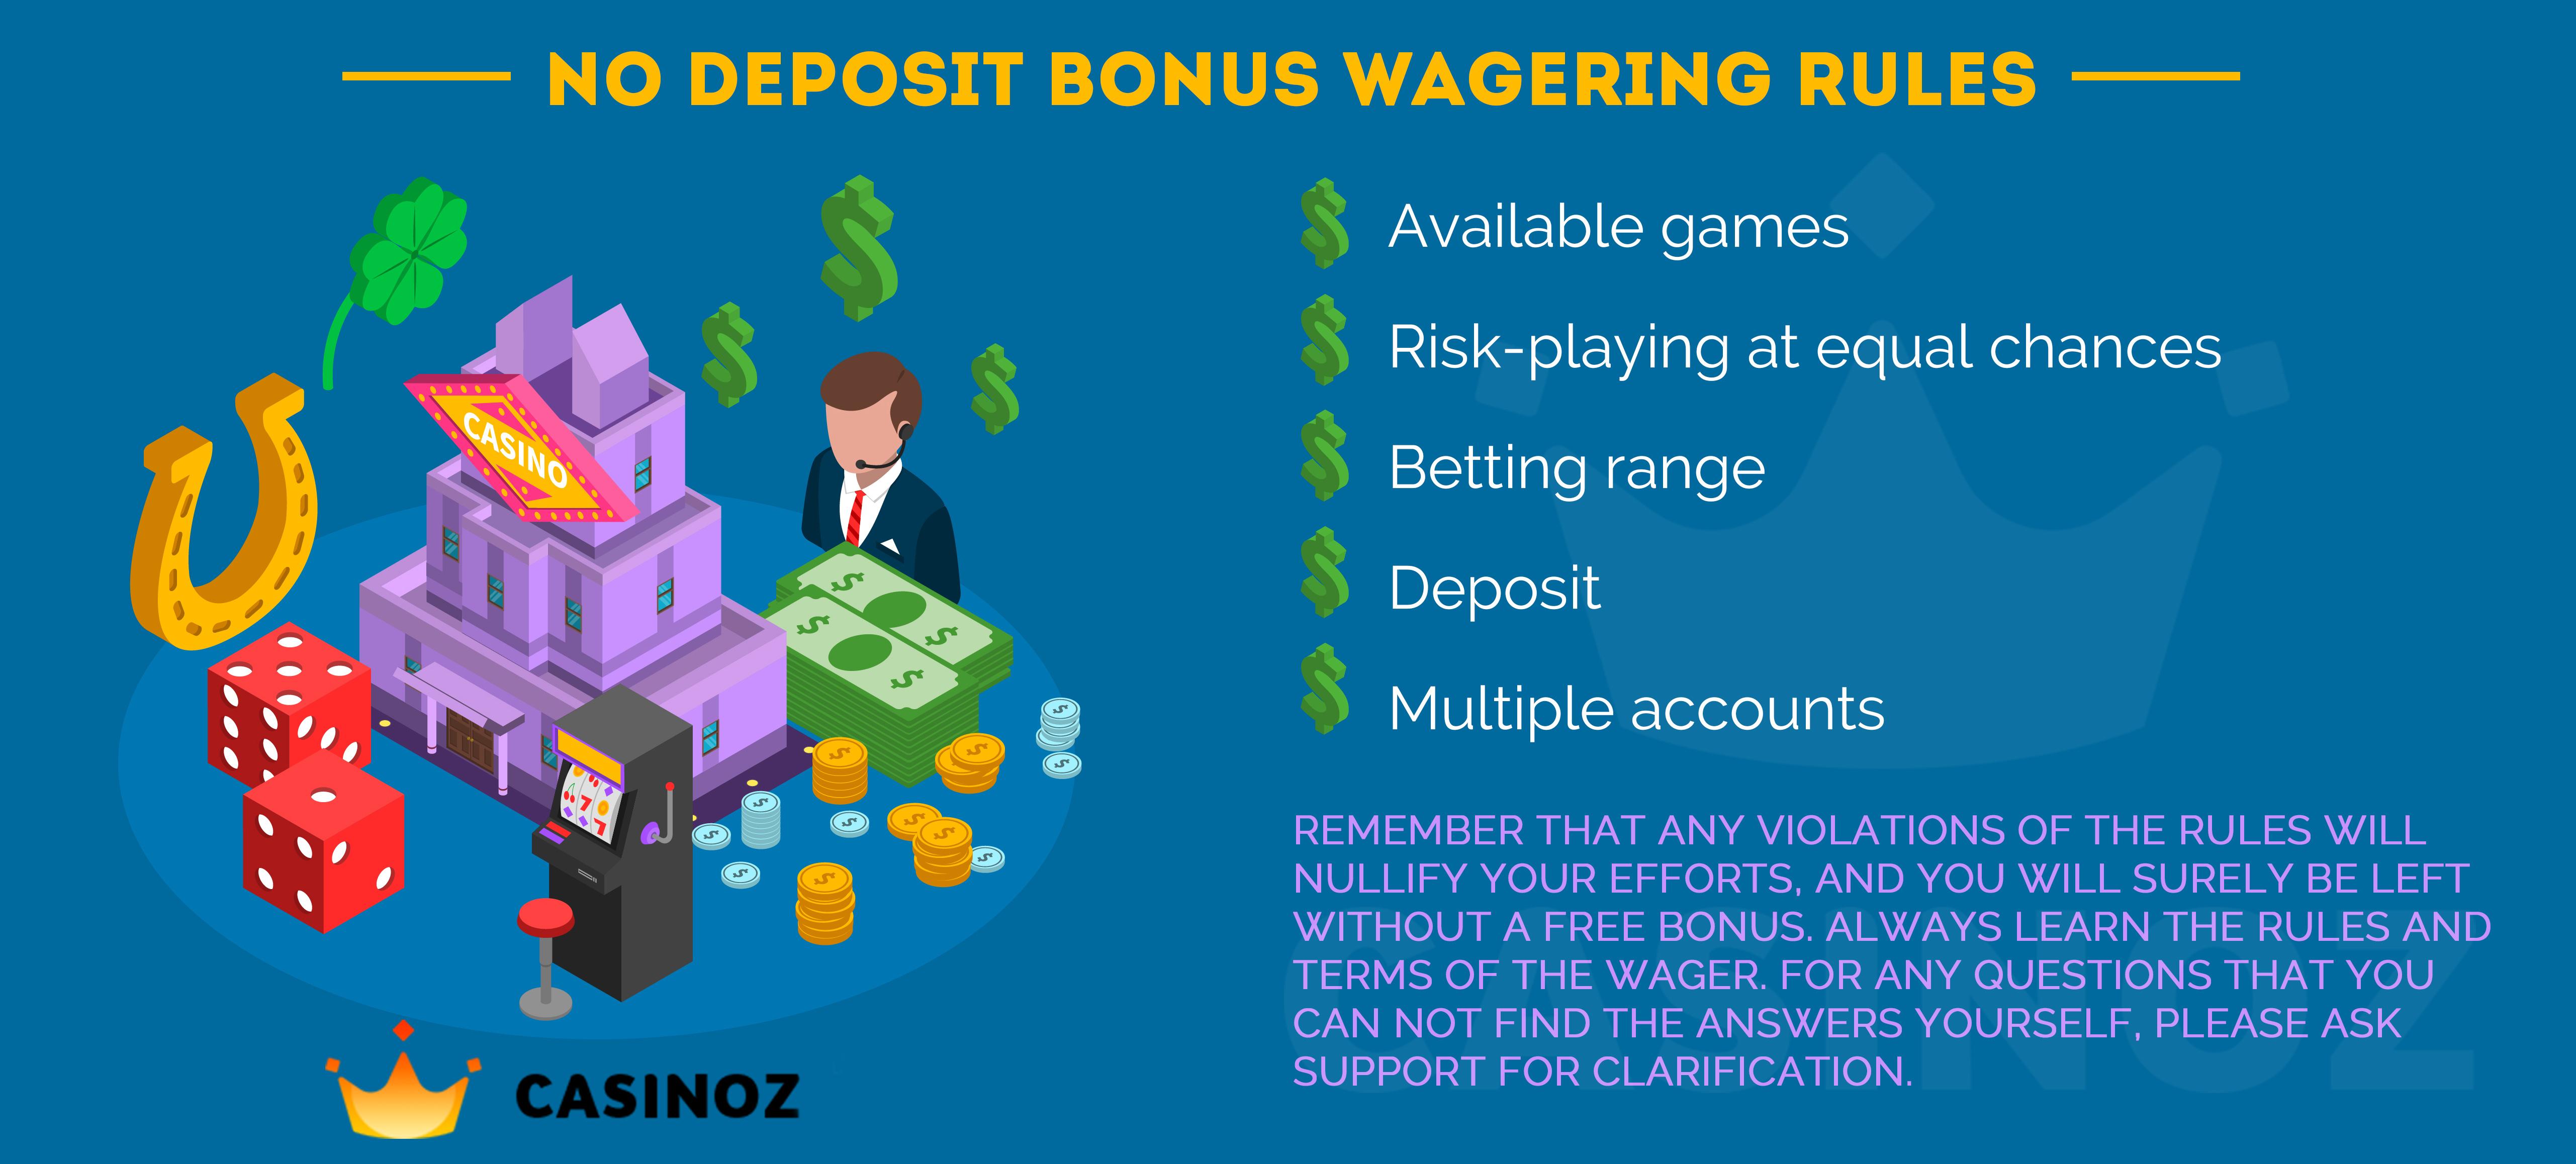 Best No Deposit Bonuses 20 October   Casinoz